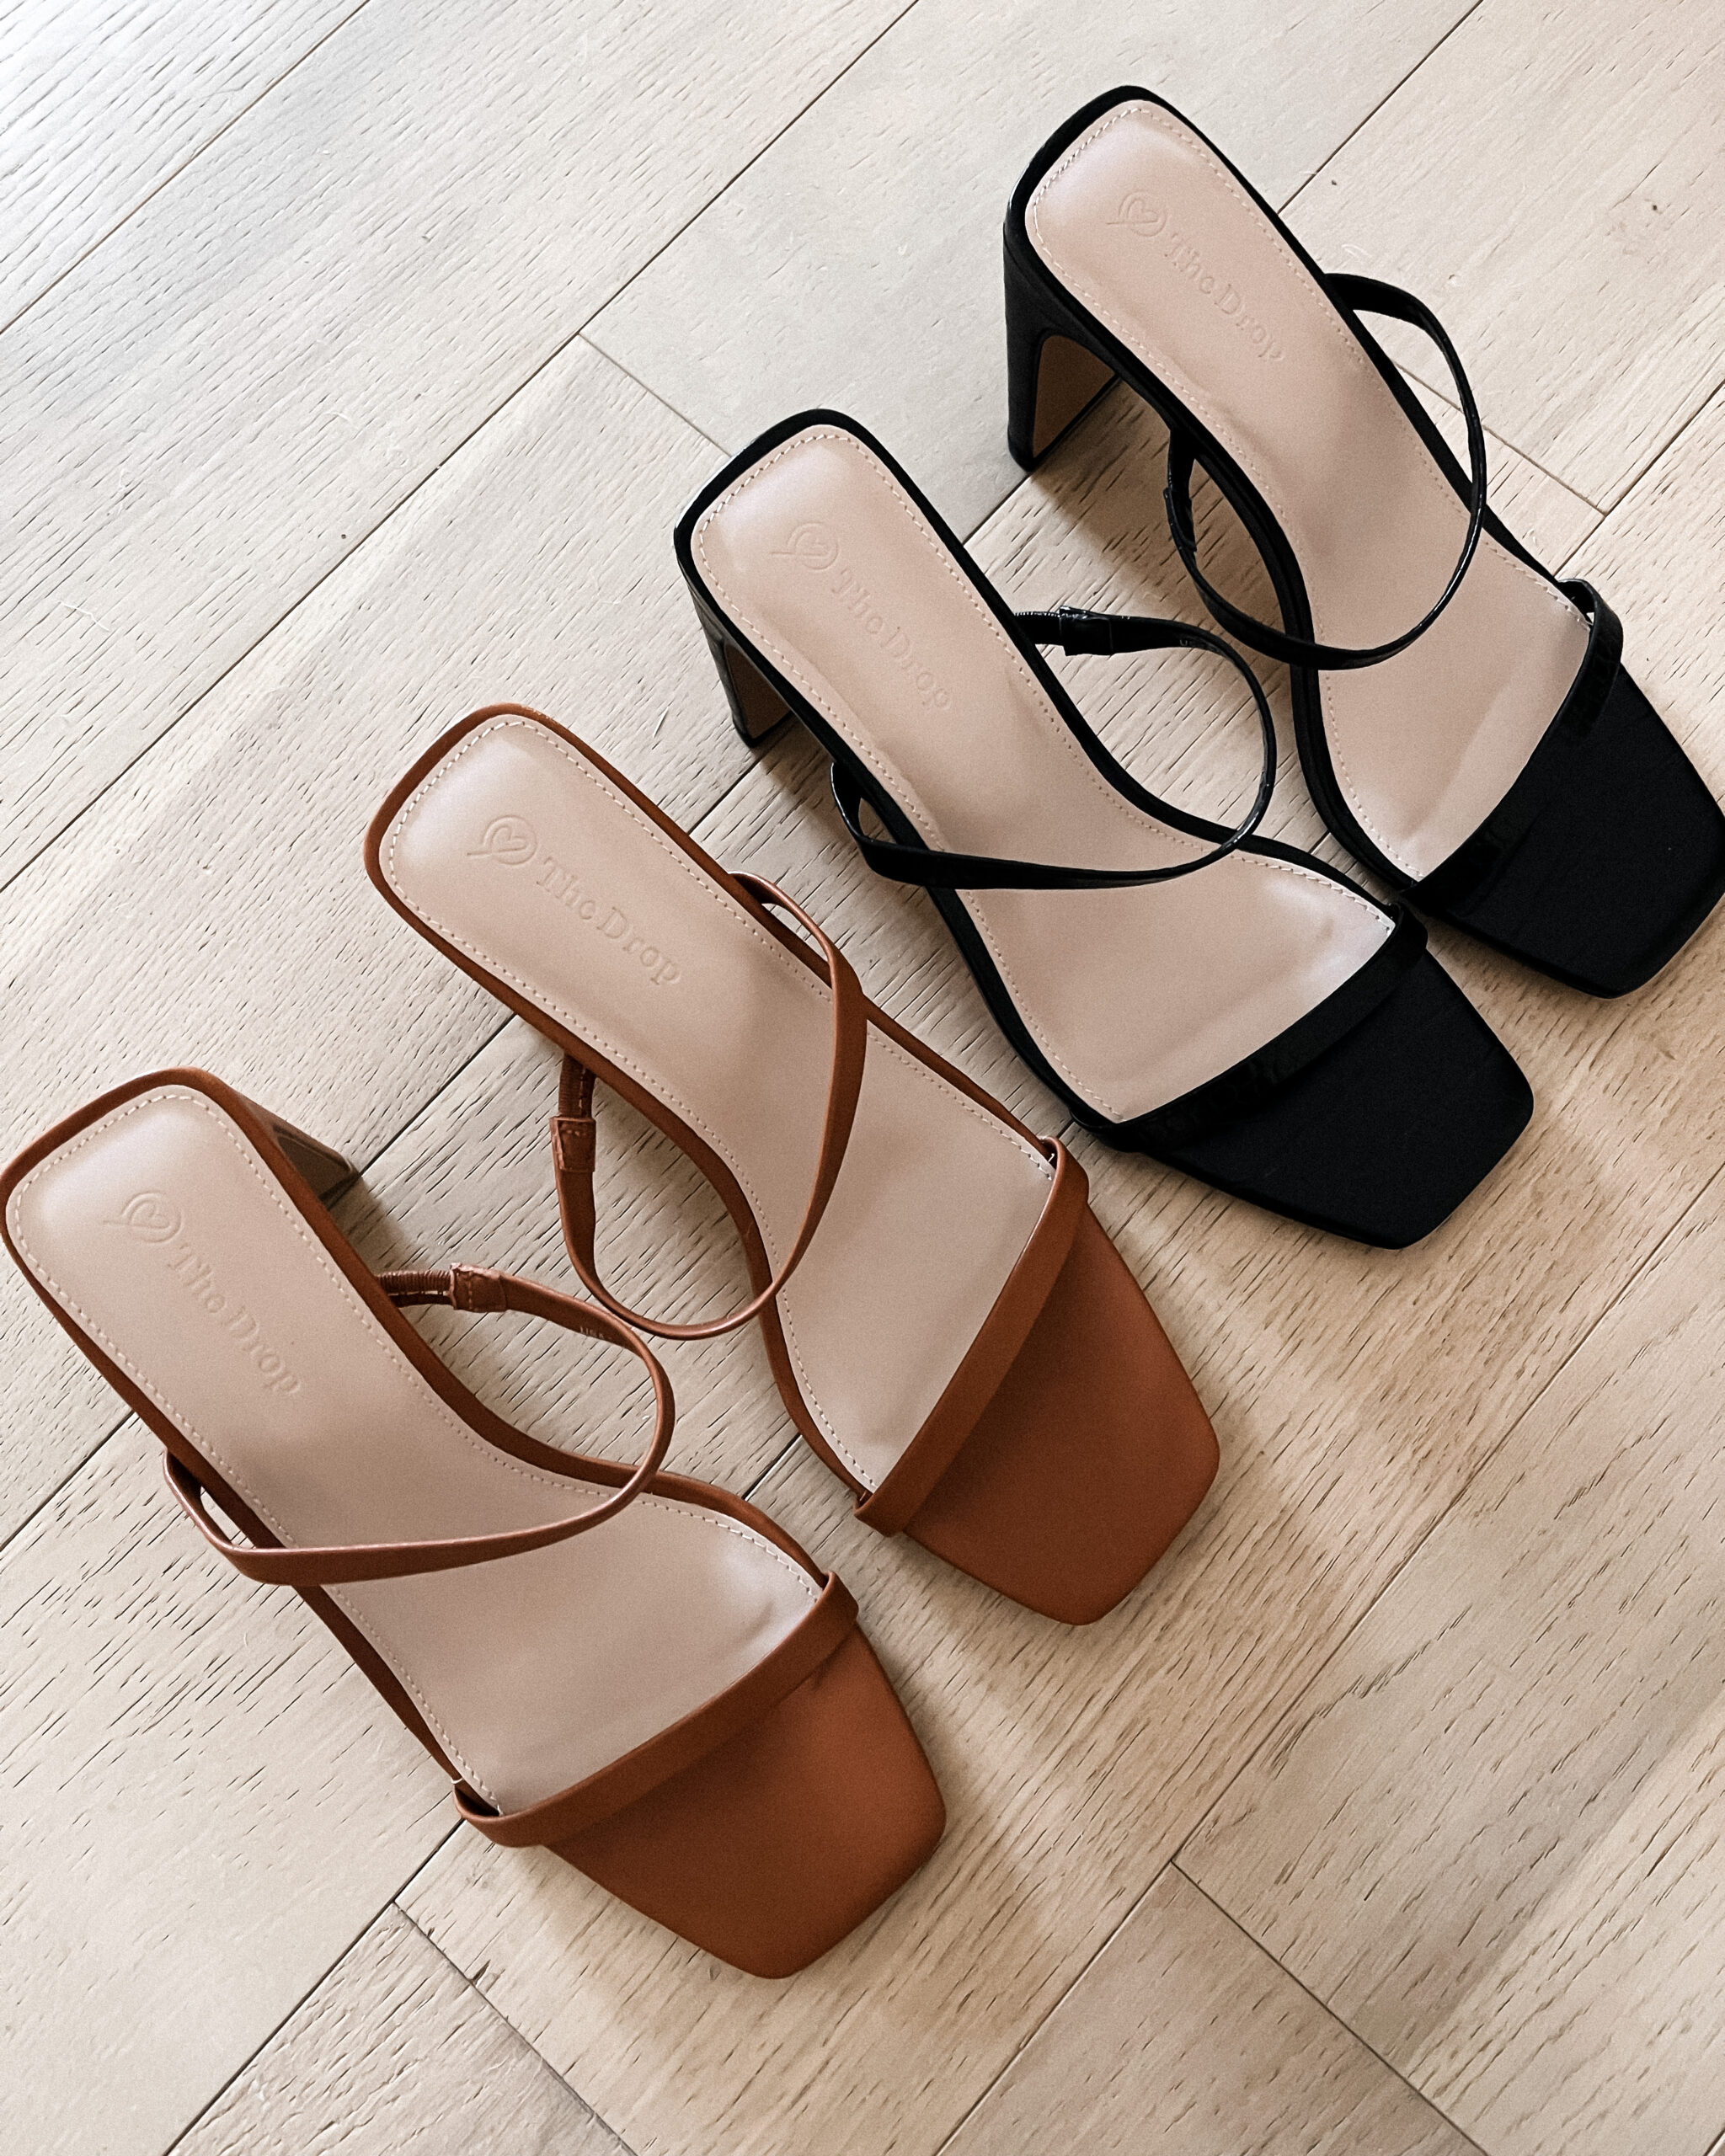 Fashion Jackson Amazon Fashion The Drop Heeled Sandals